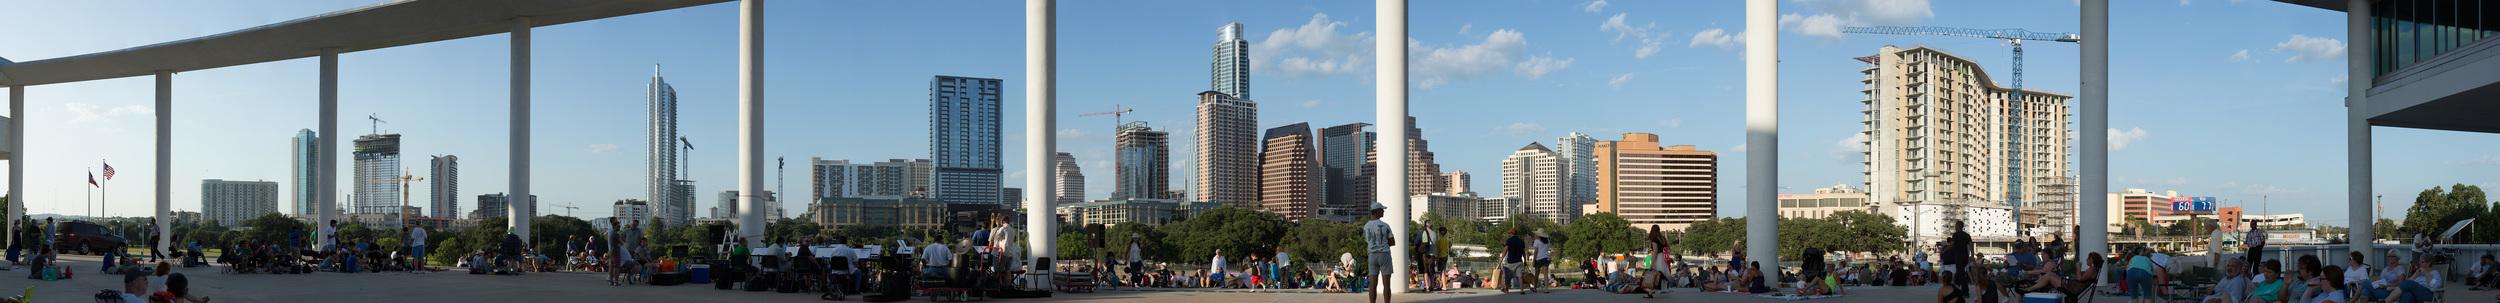 Long-Perf-Center-_-Austin-Skyline-pano-#1-FINAL.jpg